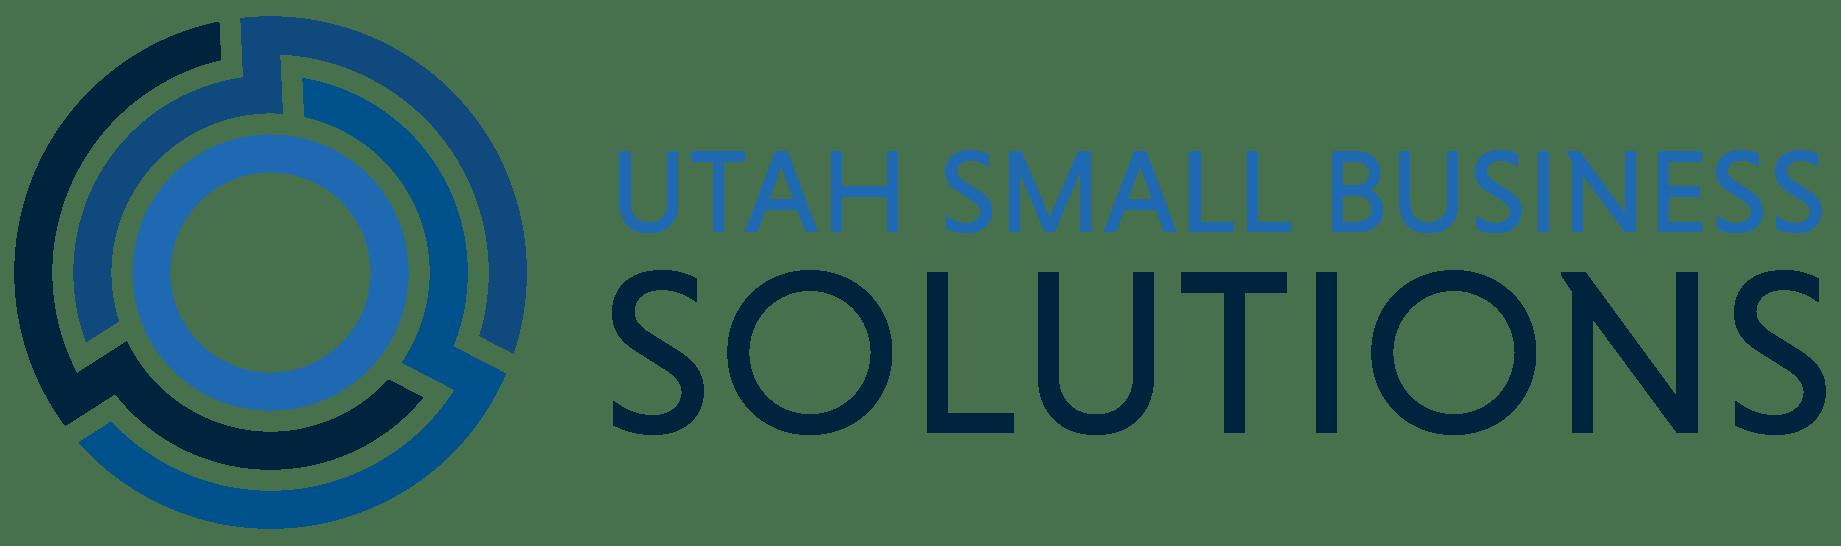 Utah Small Business Solutions